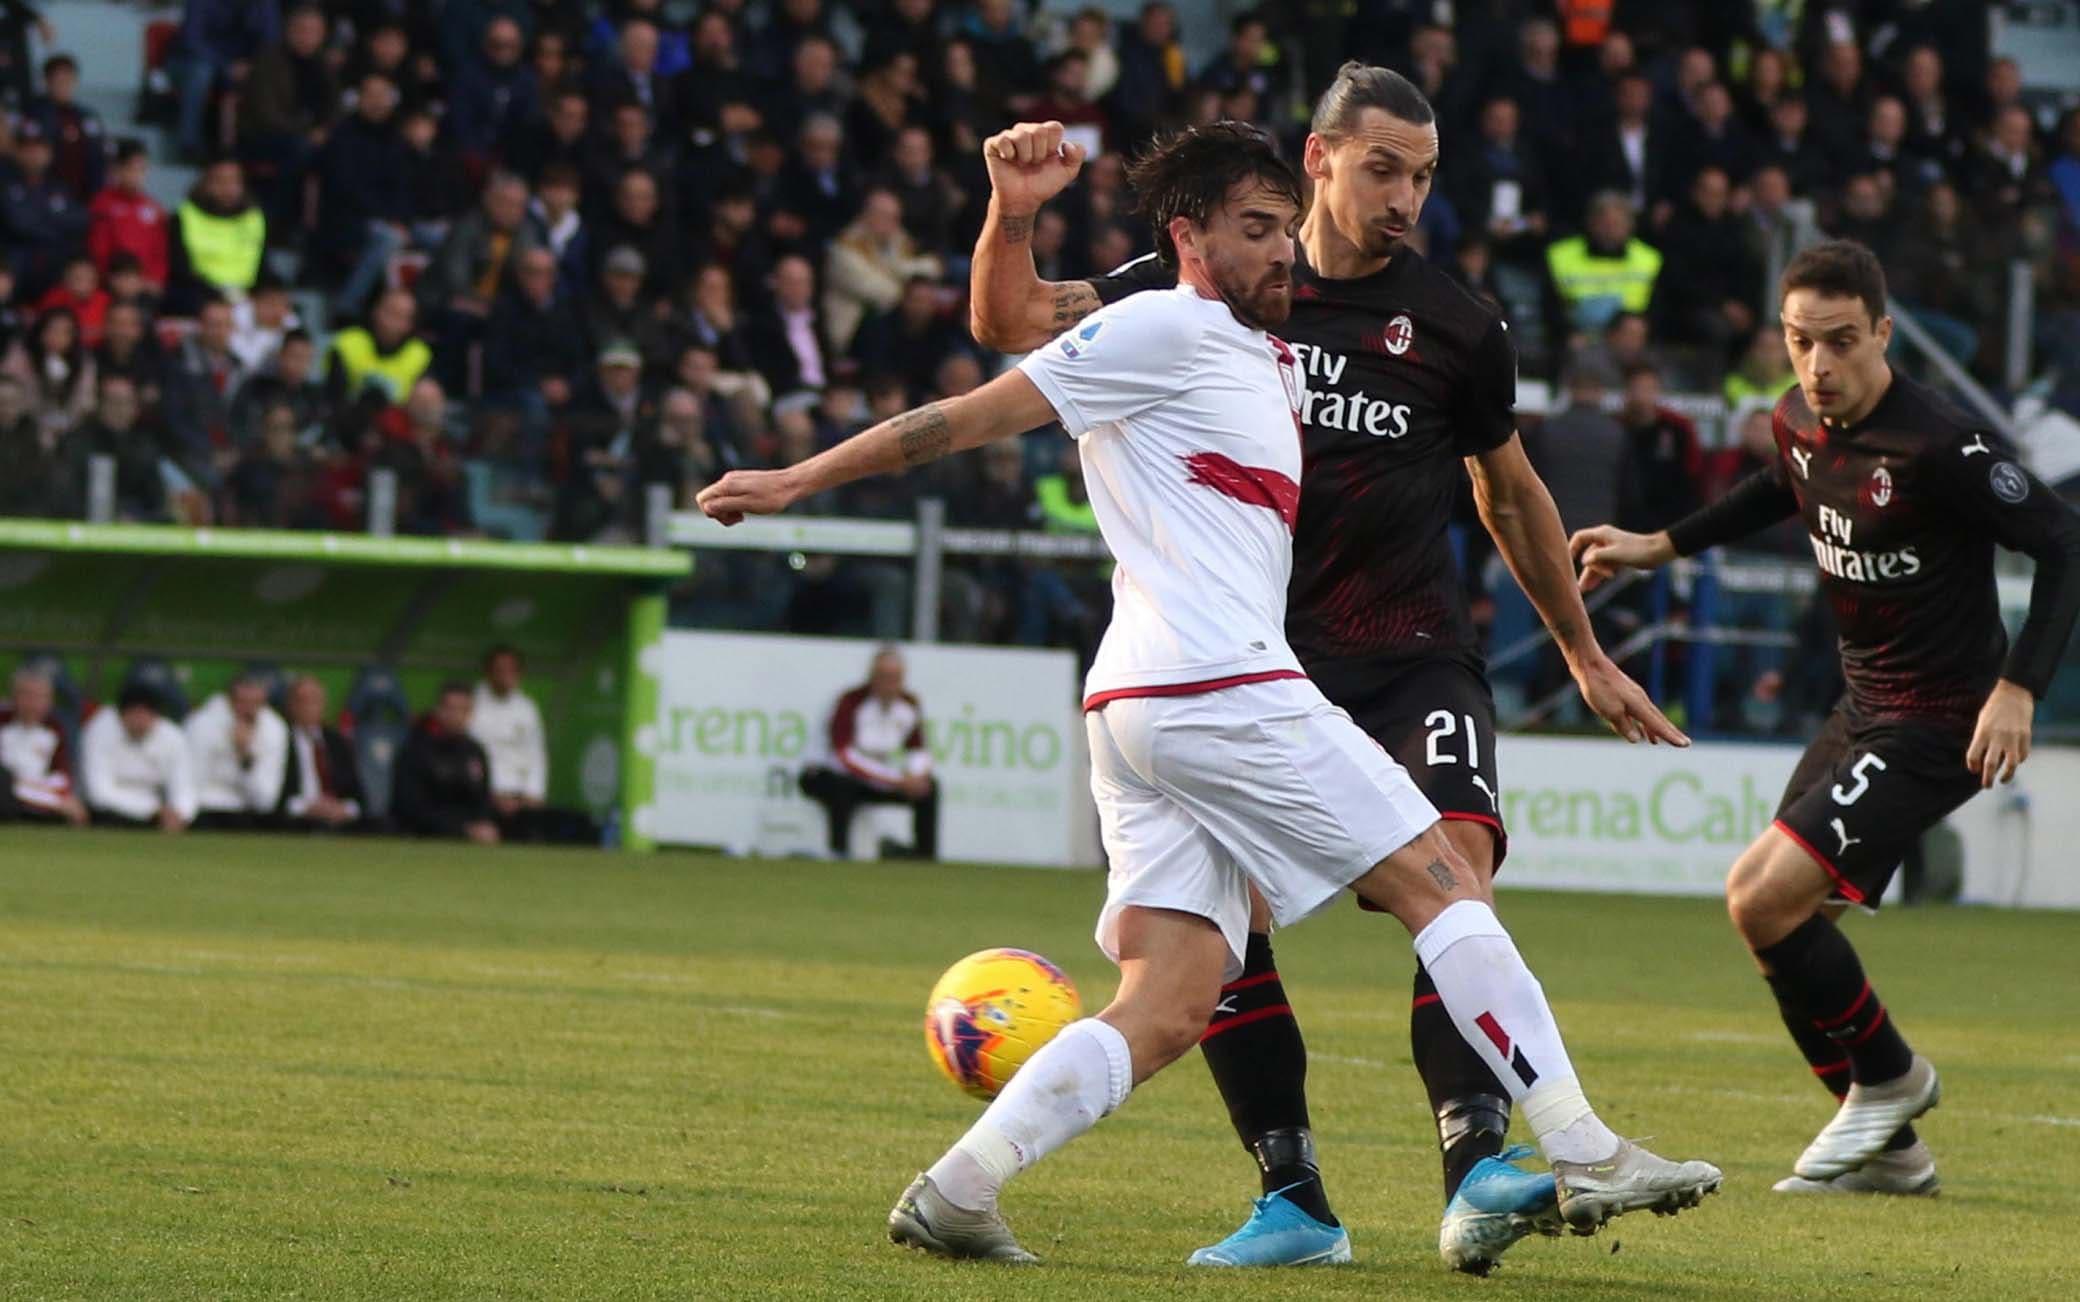 epa08119830 Milan's Zlatan Ibrahimovic (C) scores during the Italian Serie A soccer match between Cagliari Calcio and AC Milan at Sardegna Arena stadium in Cagliari, Italy,11 January 2020.  EPA/FABIO MURRU